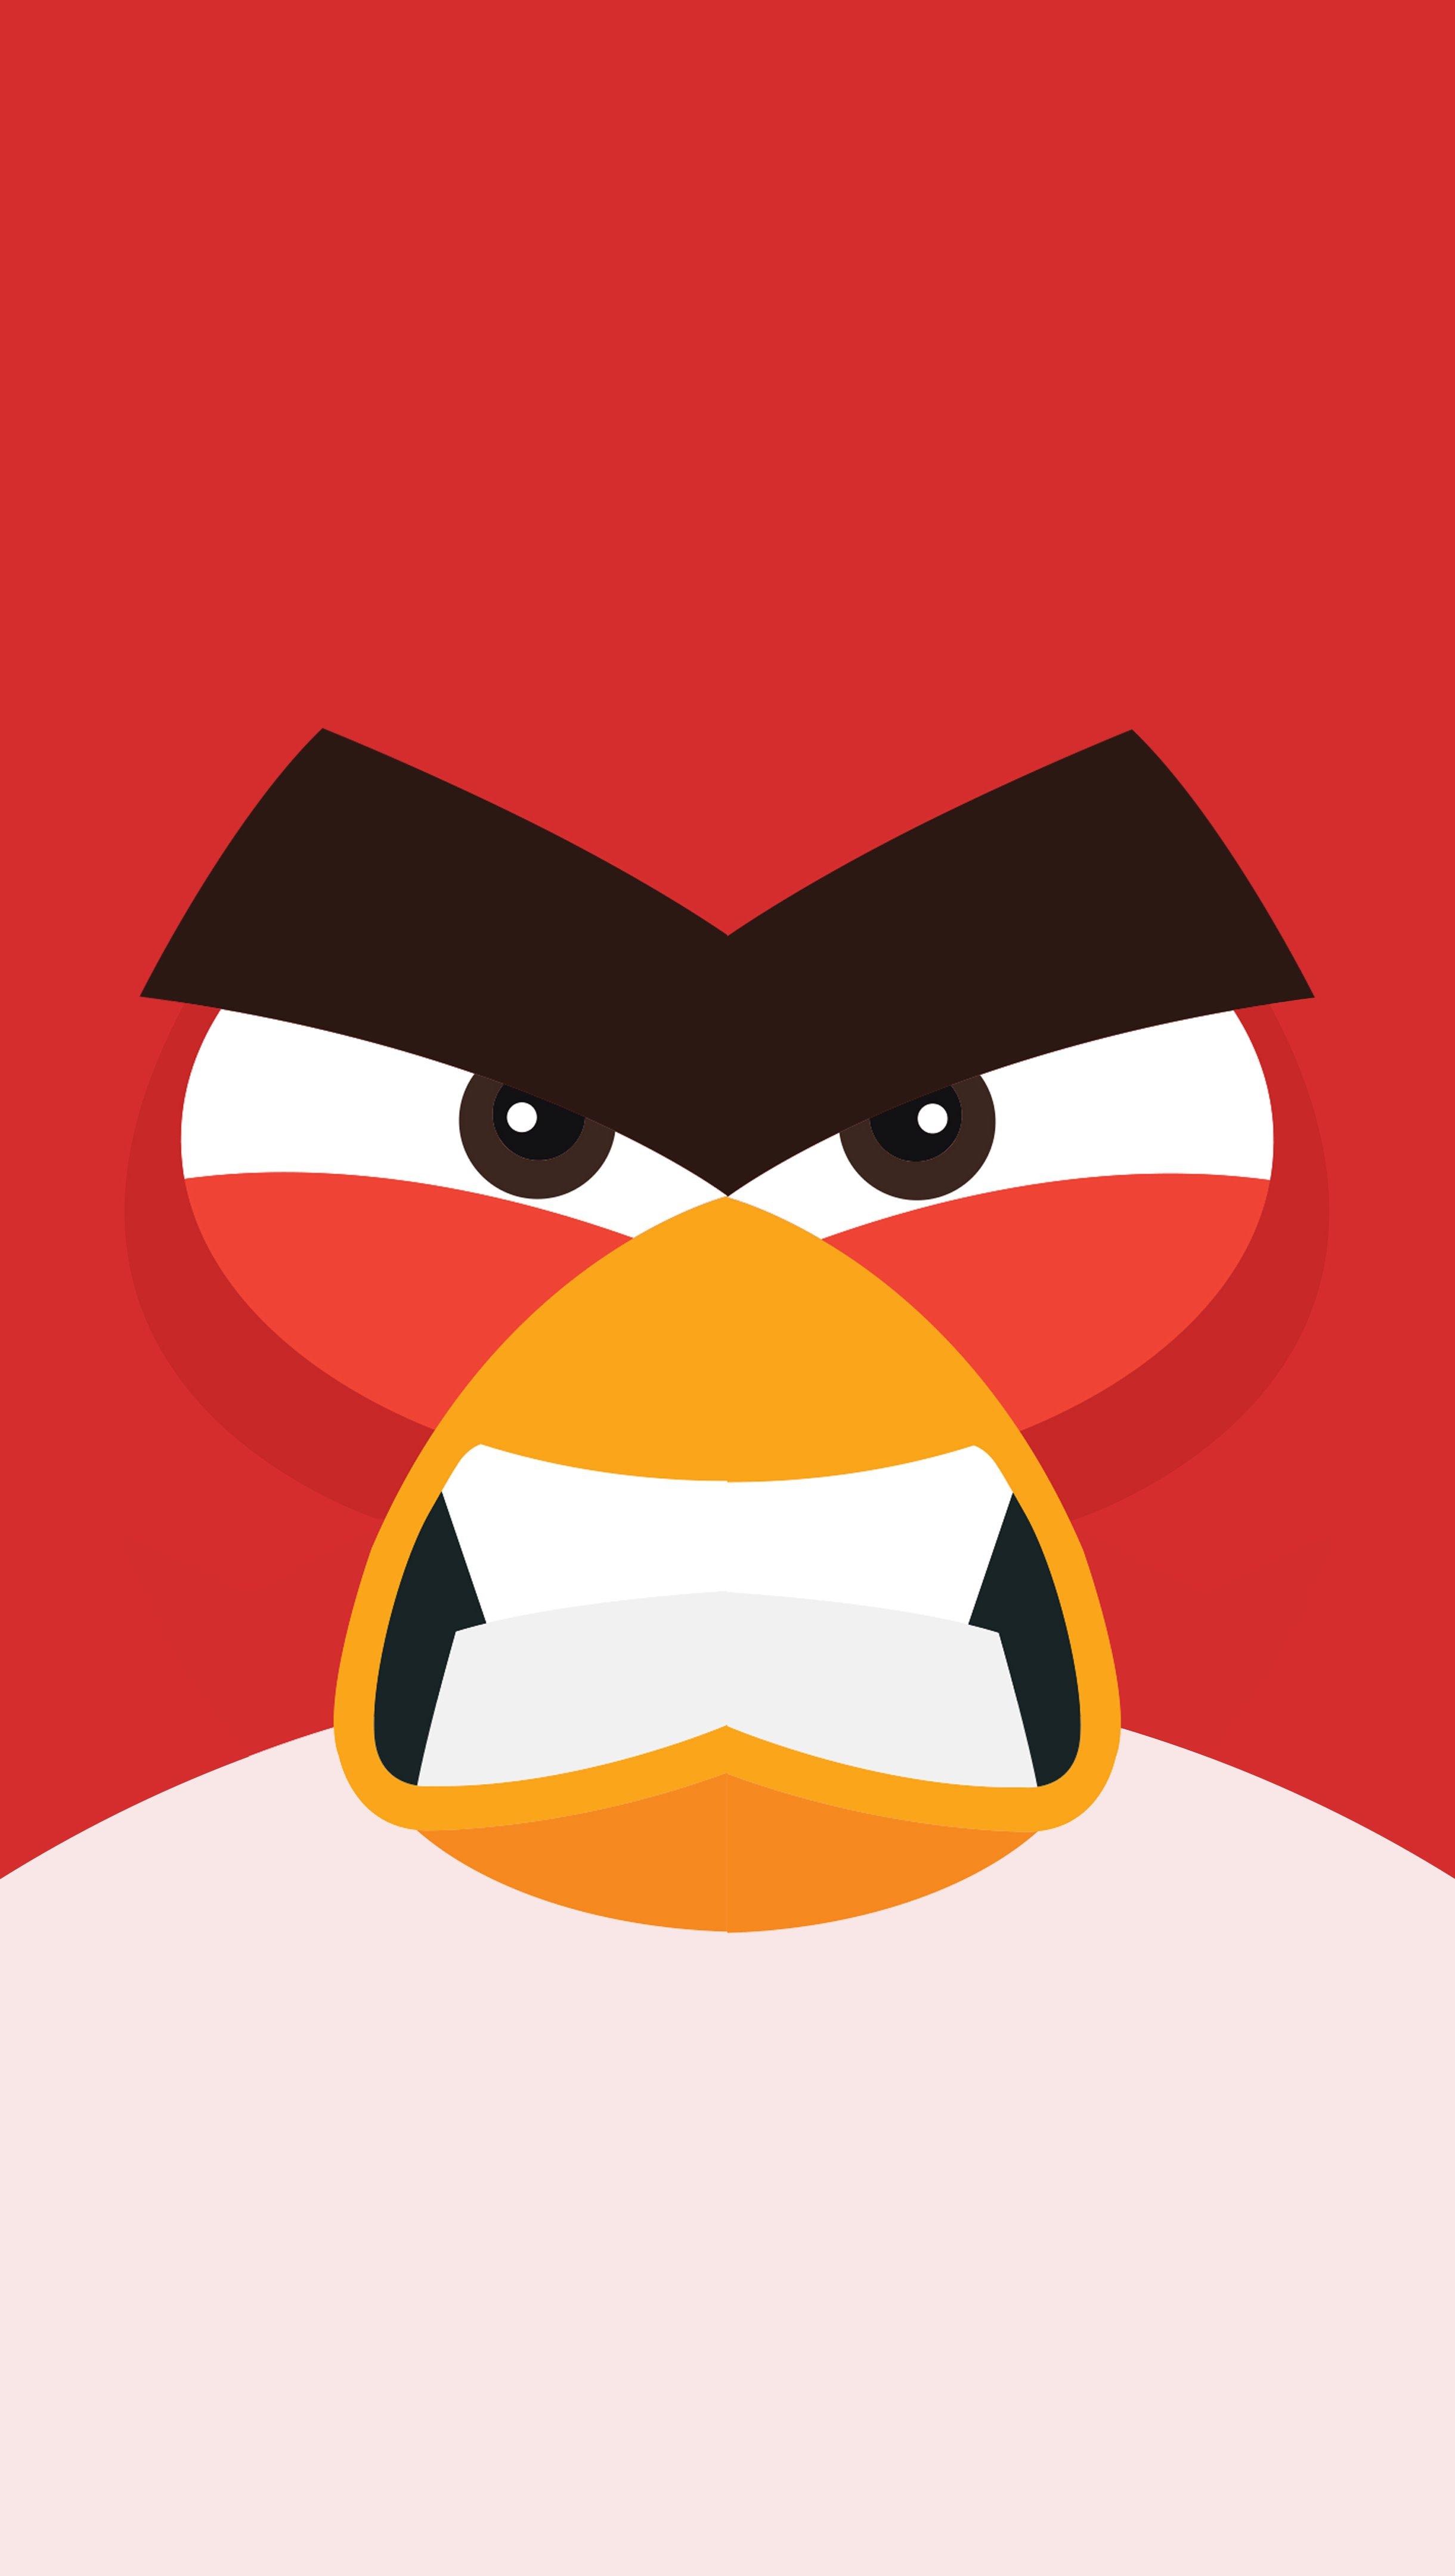 Fondos de pantalla Angry Bird Minimalista Vertical